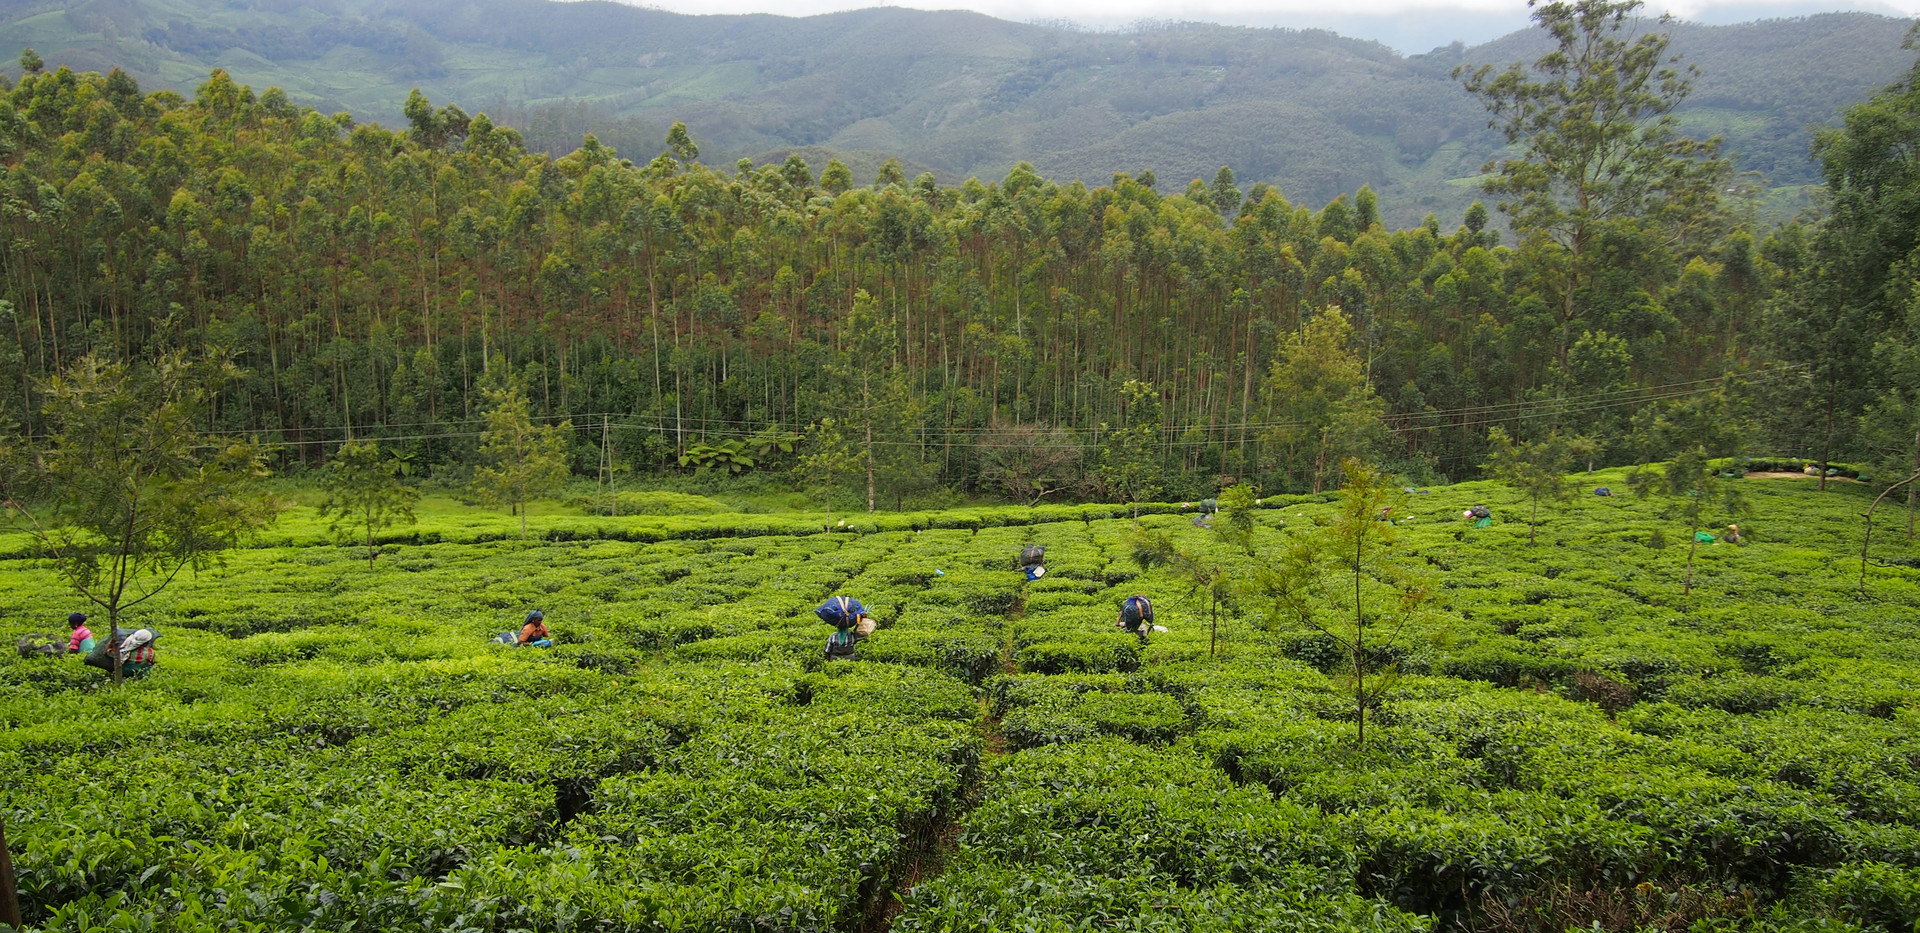 tea-plantation-1910714.jpg